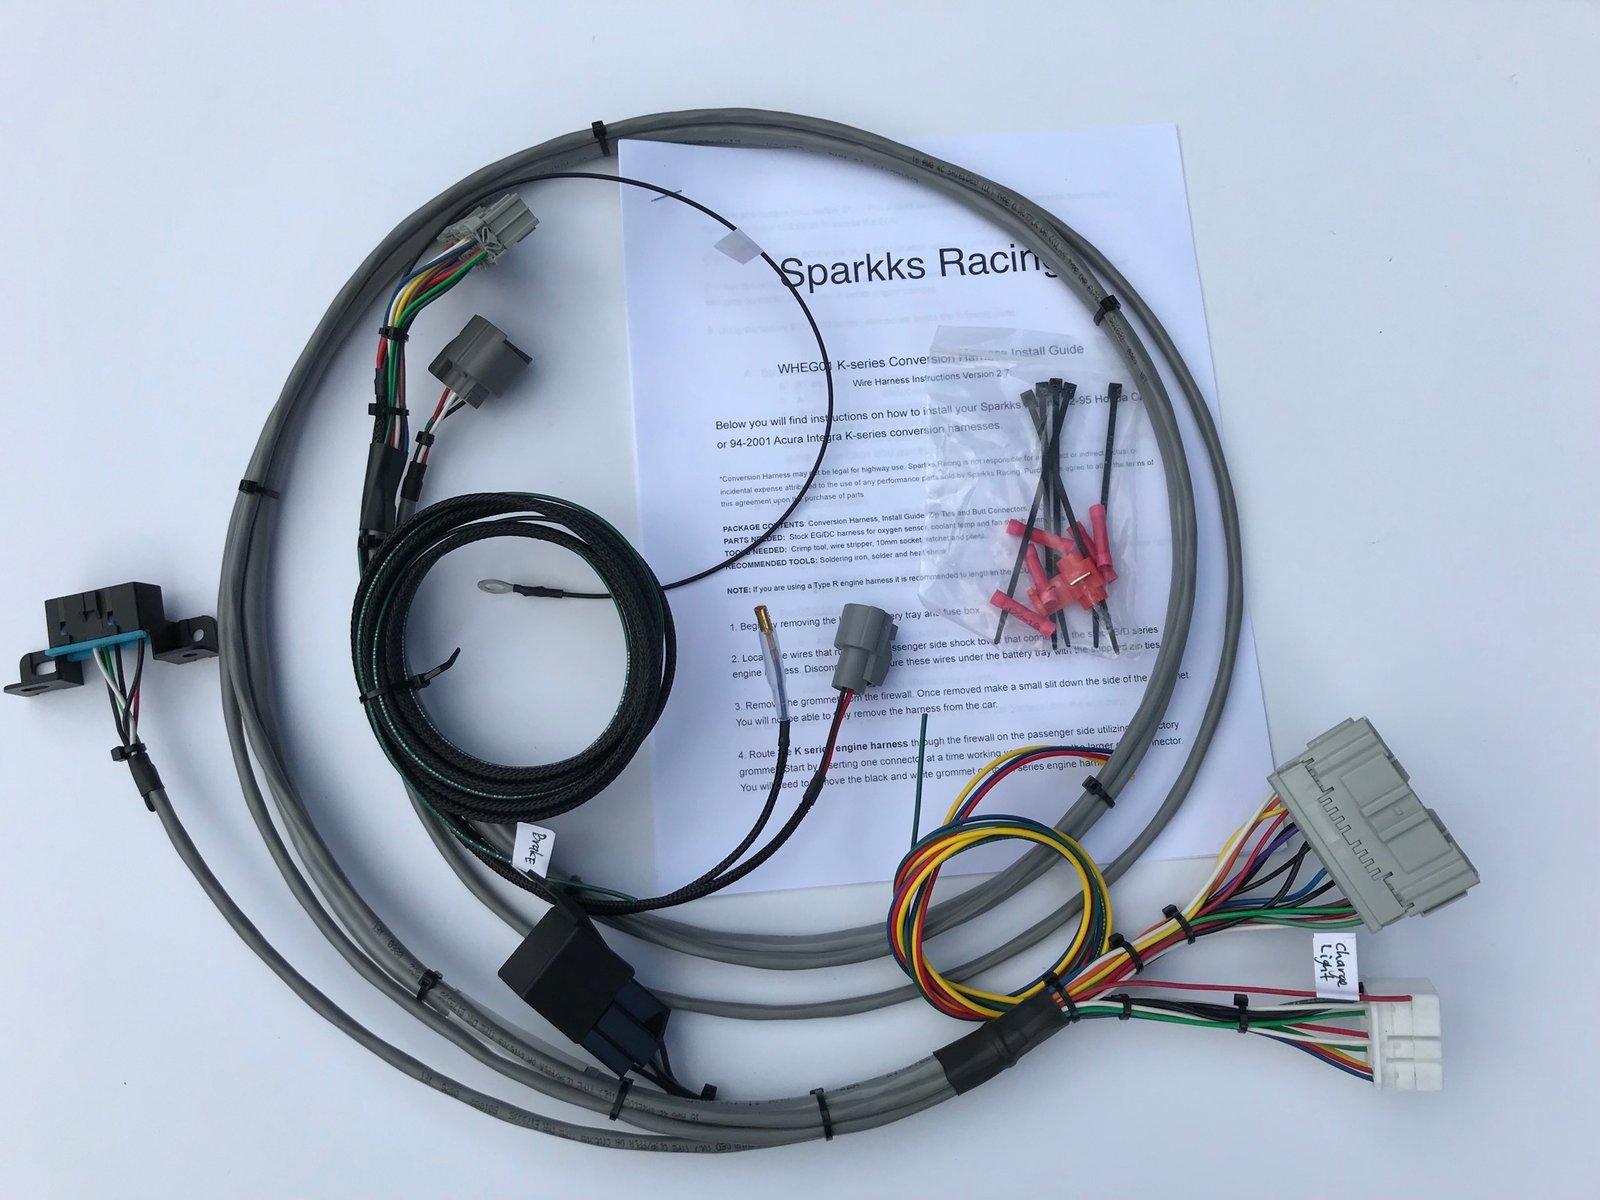 sparkks racing honda kseries conversion harness 92 95 civic or 94  image of sparkks racing honda kseries conversion harness 92 95 civic or 94 2001